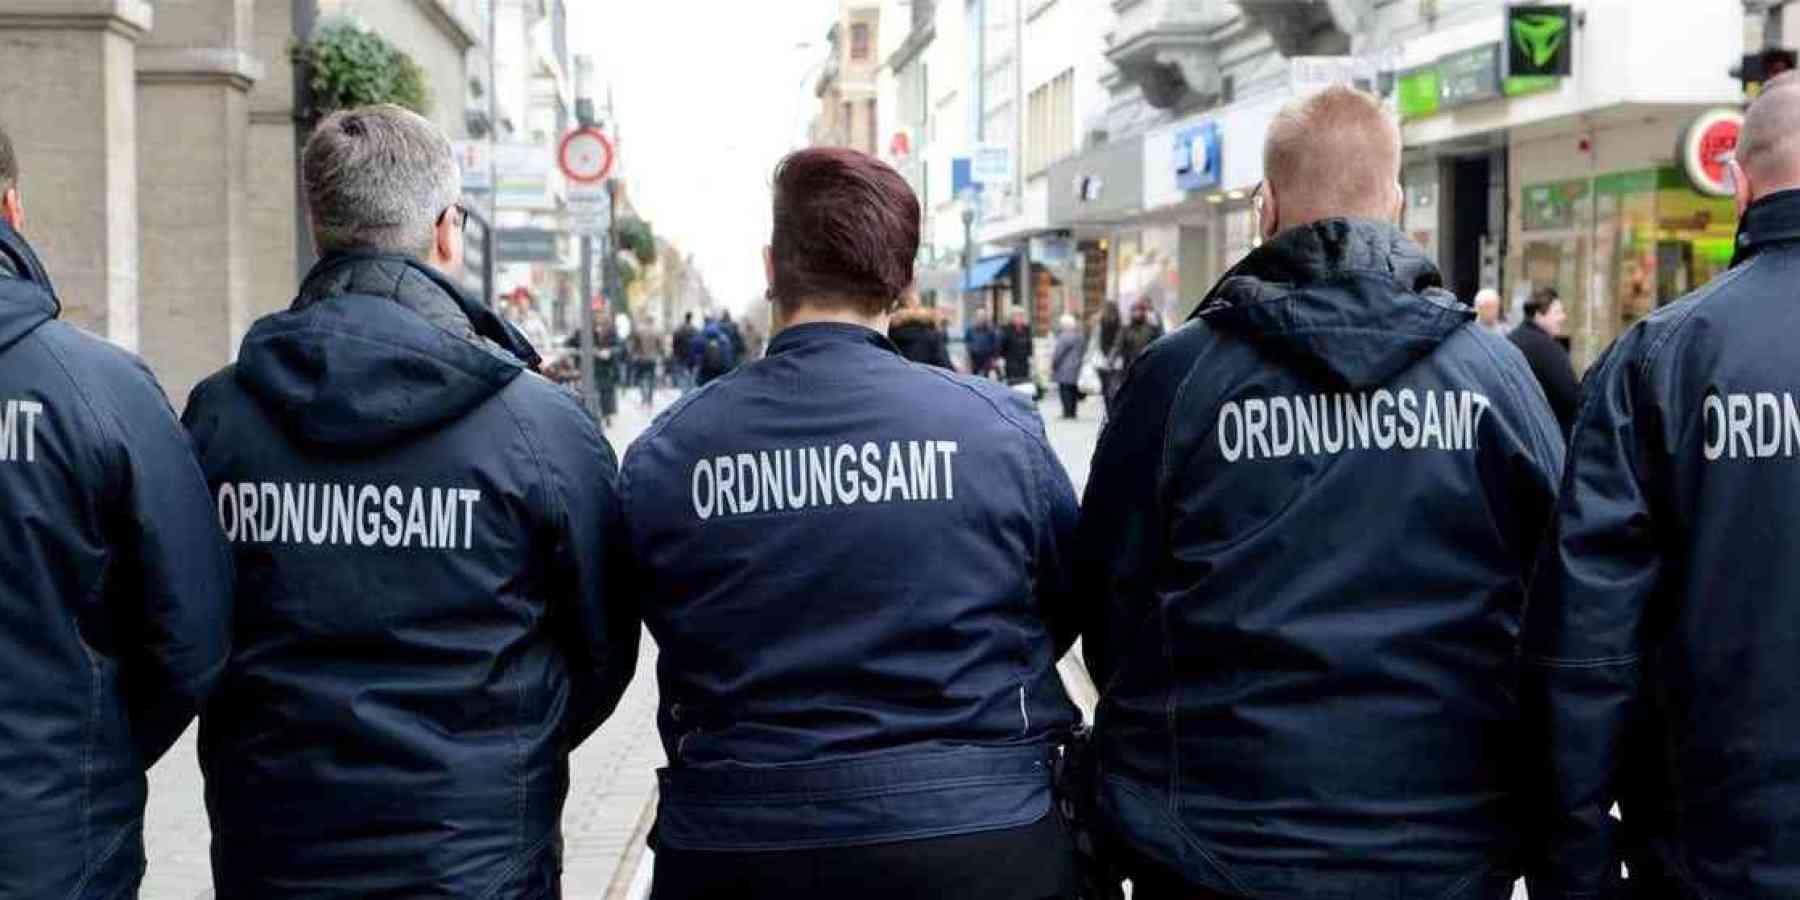 Ordnungsamt verstärkt Präsenz an Jüdefelderstraße